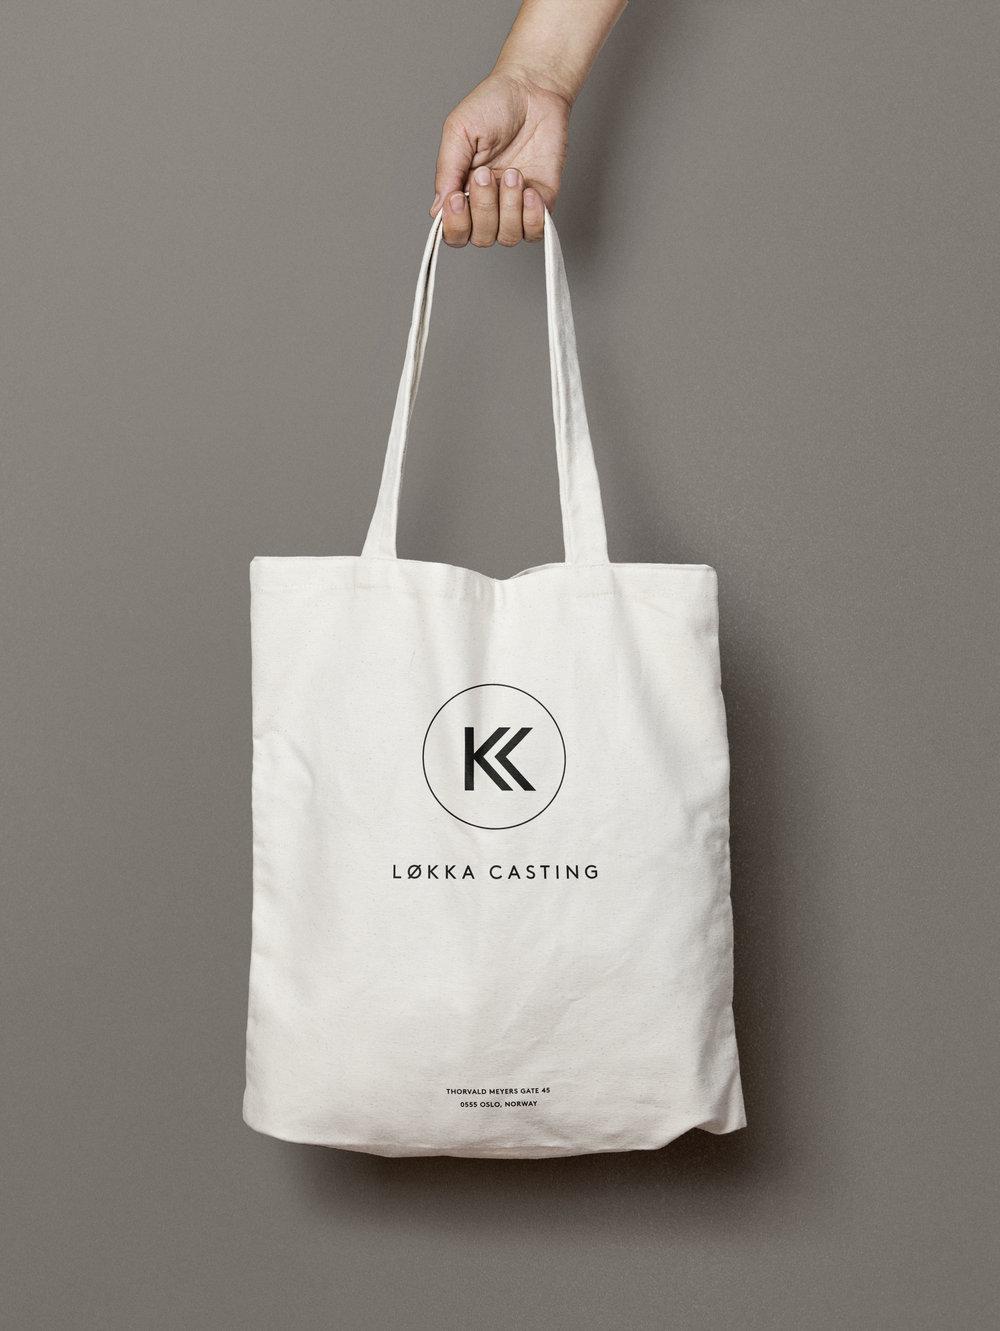 Løkka-Casting-Tote-Bag.jpg